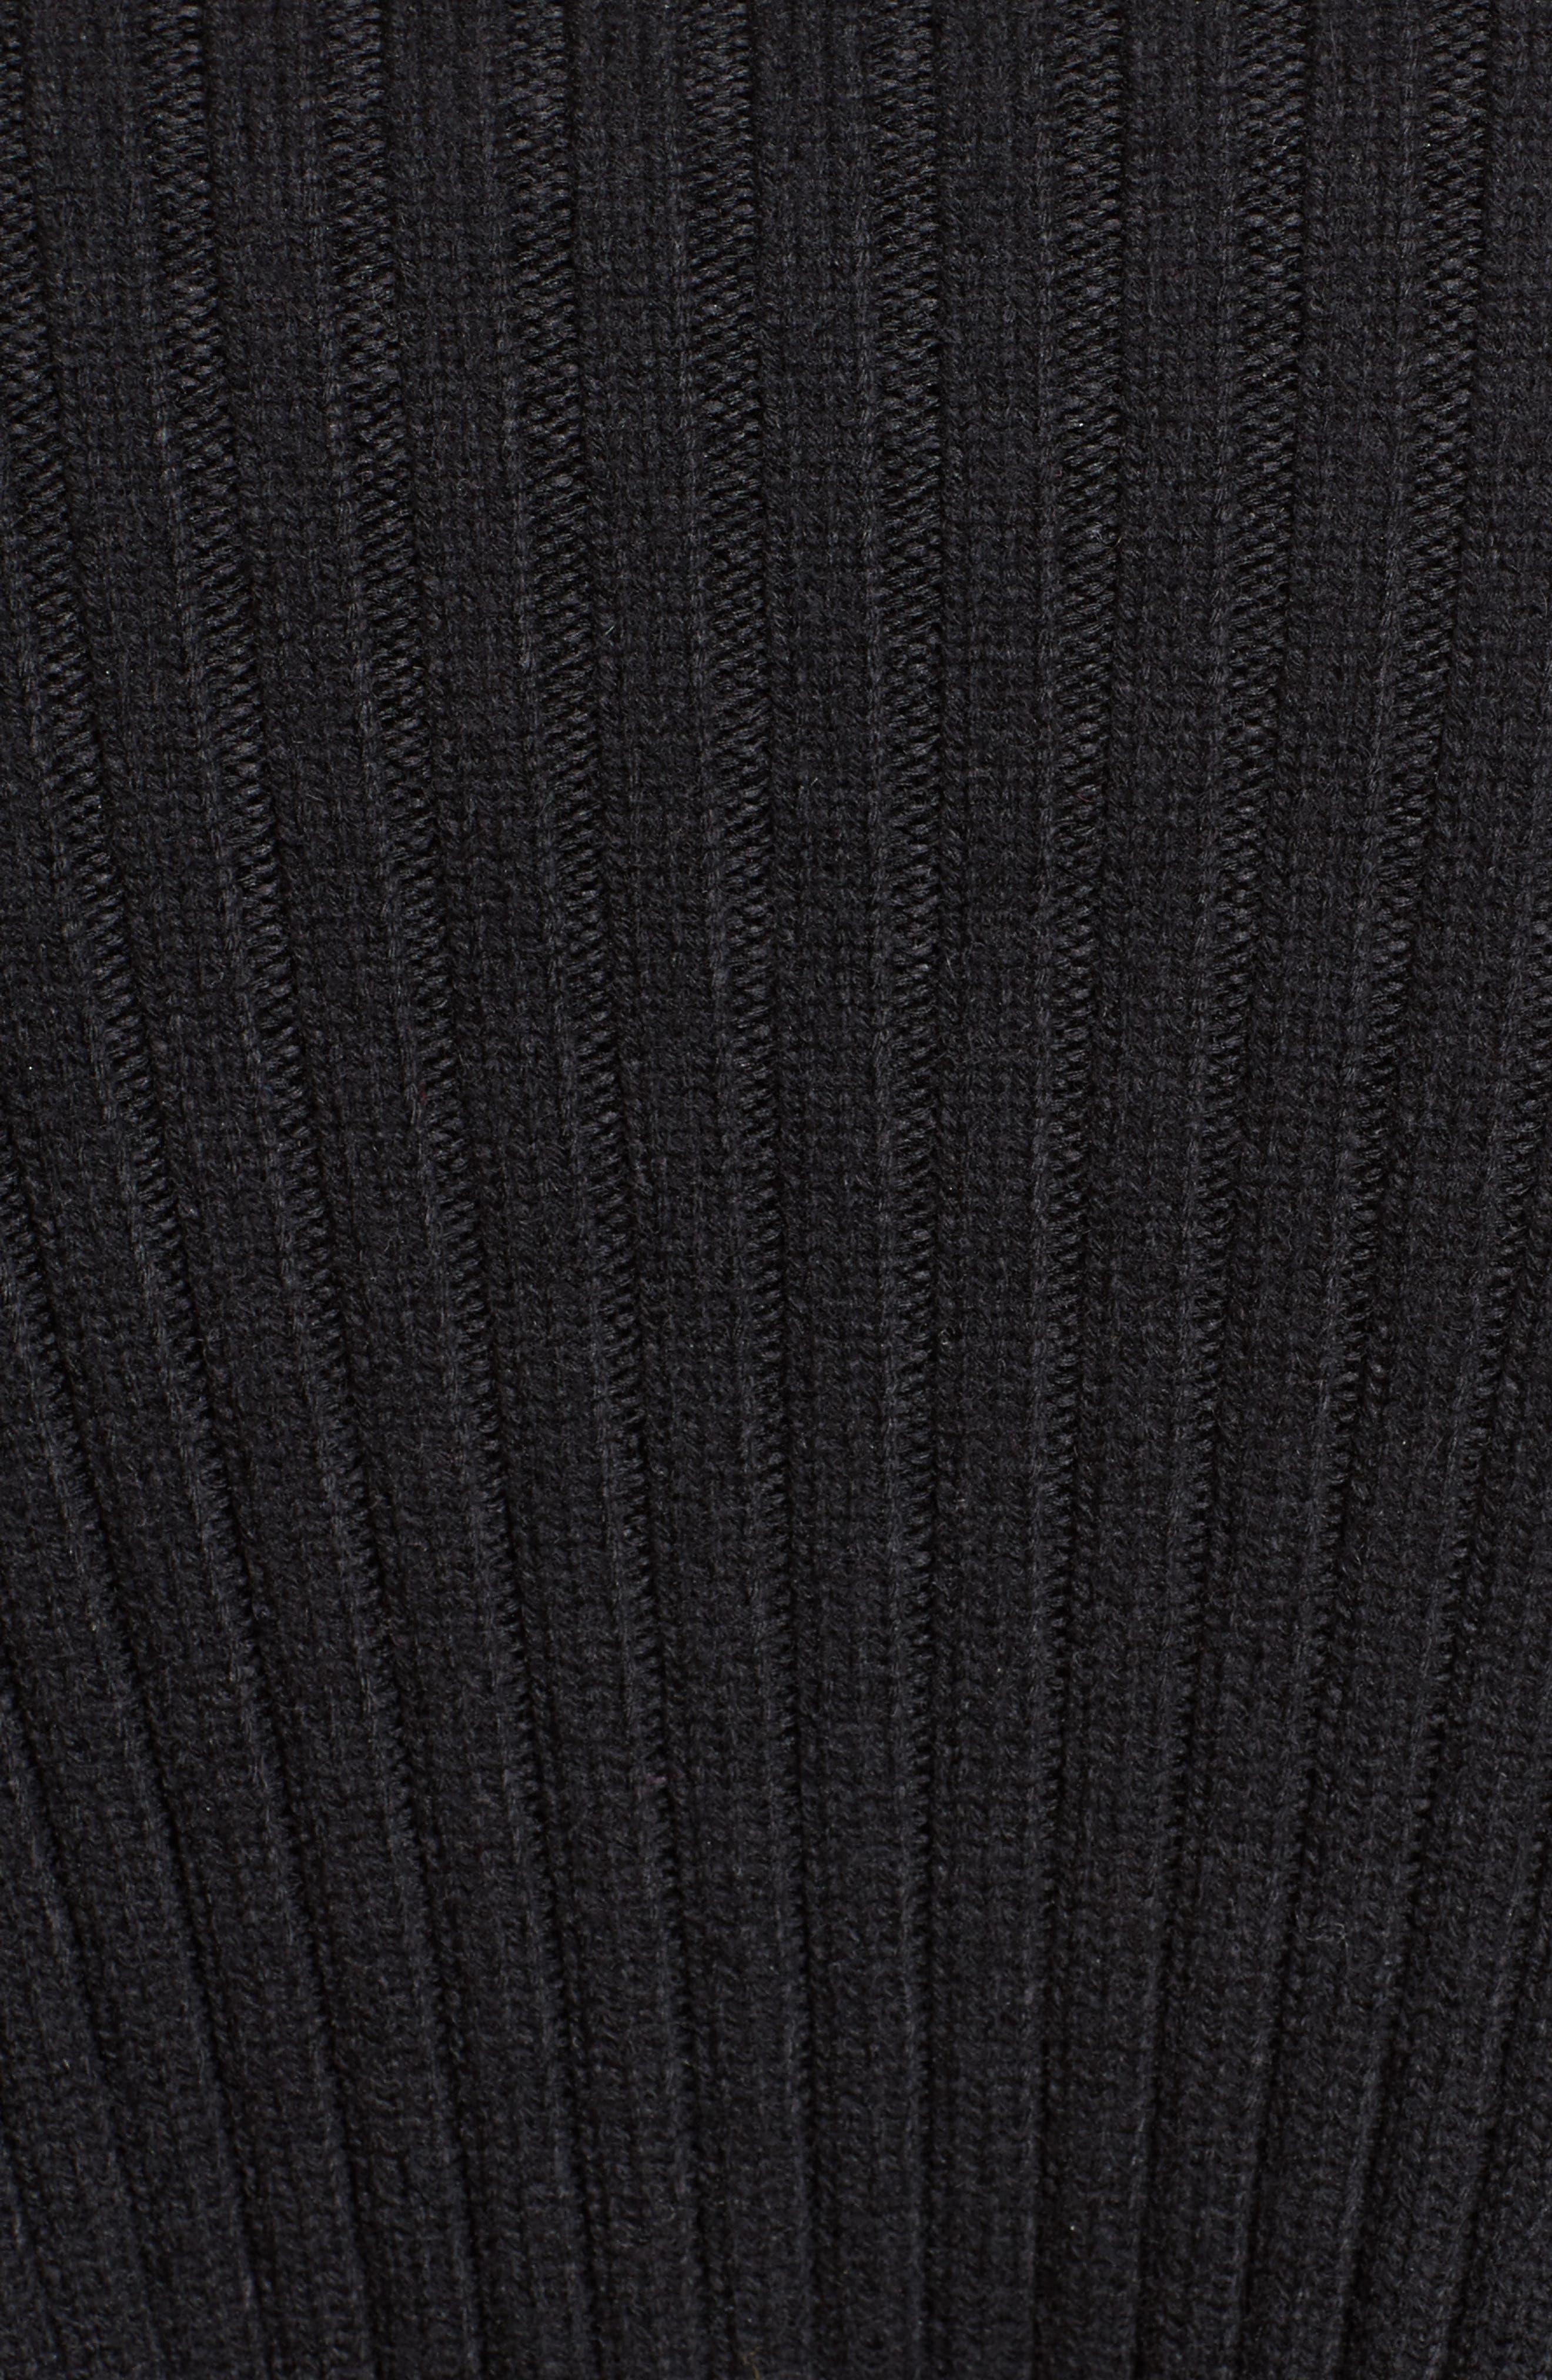 Wool & Cashmere Blend Turtleneck Dress,                             Alternate thumbnail 3, color,                             Black